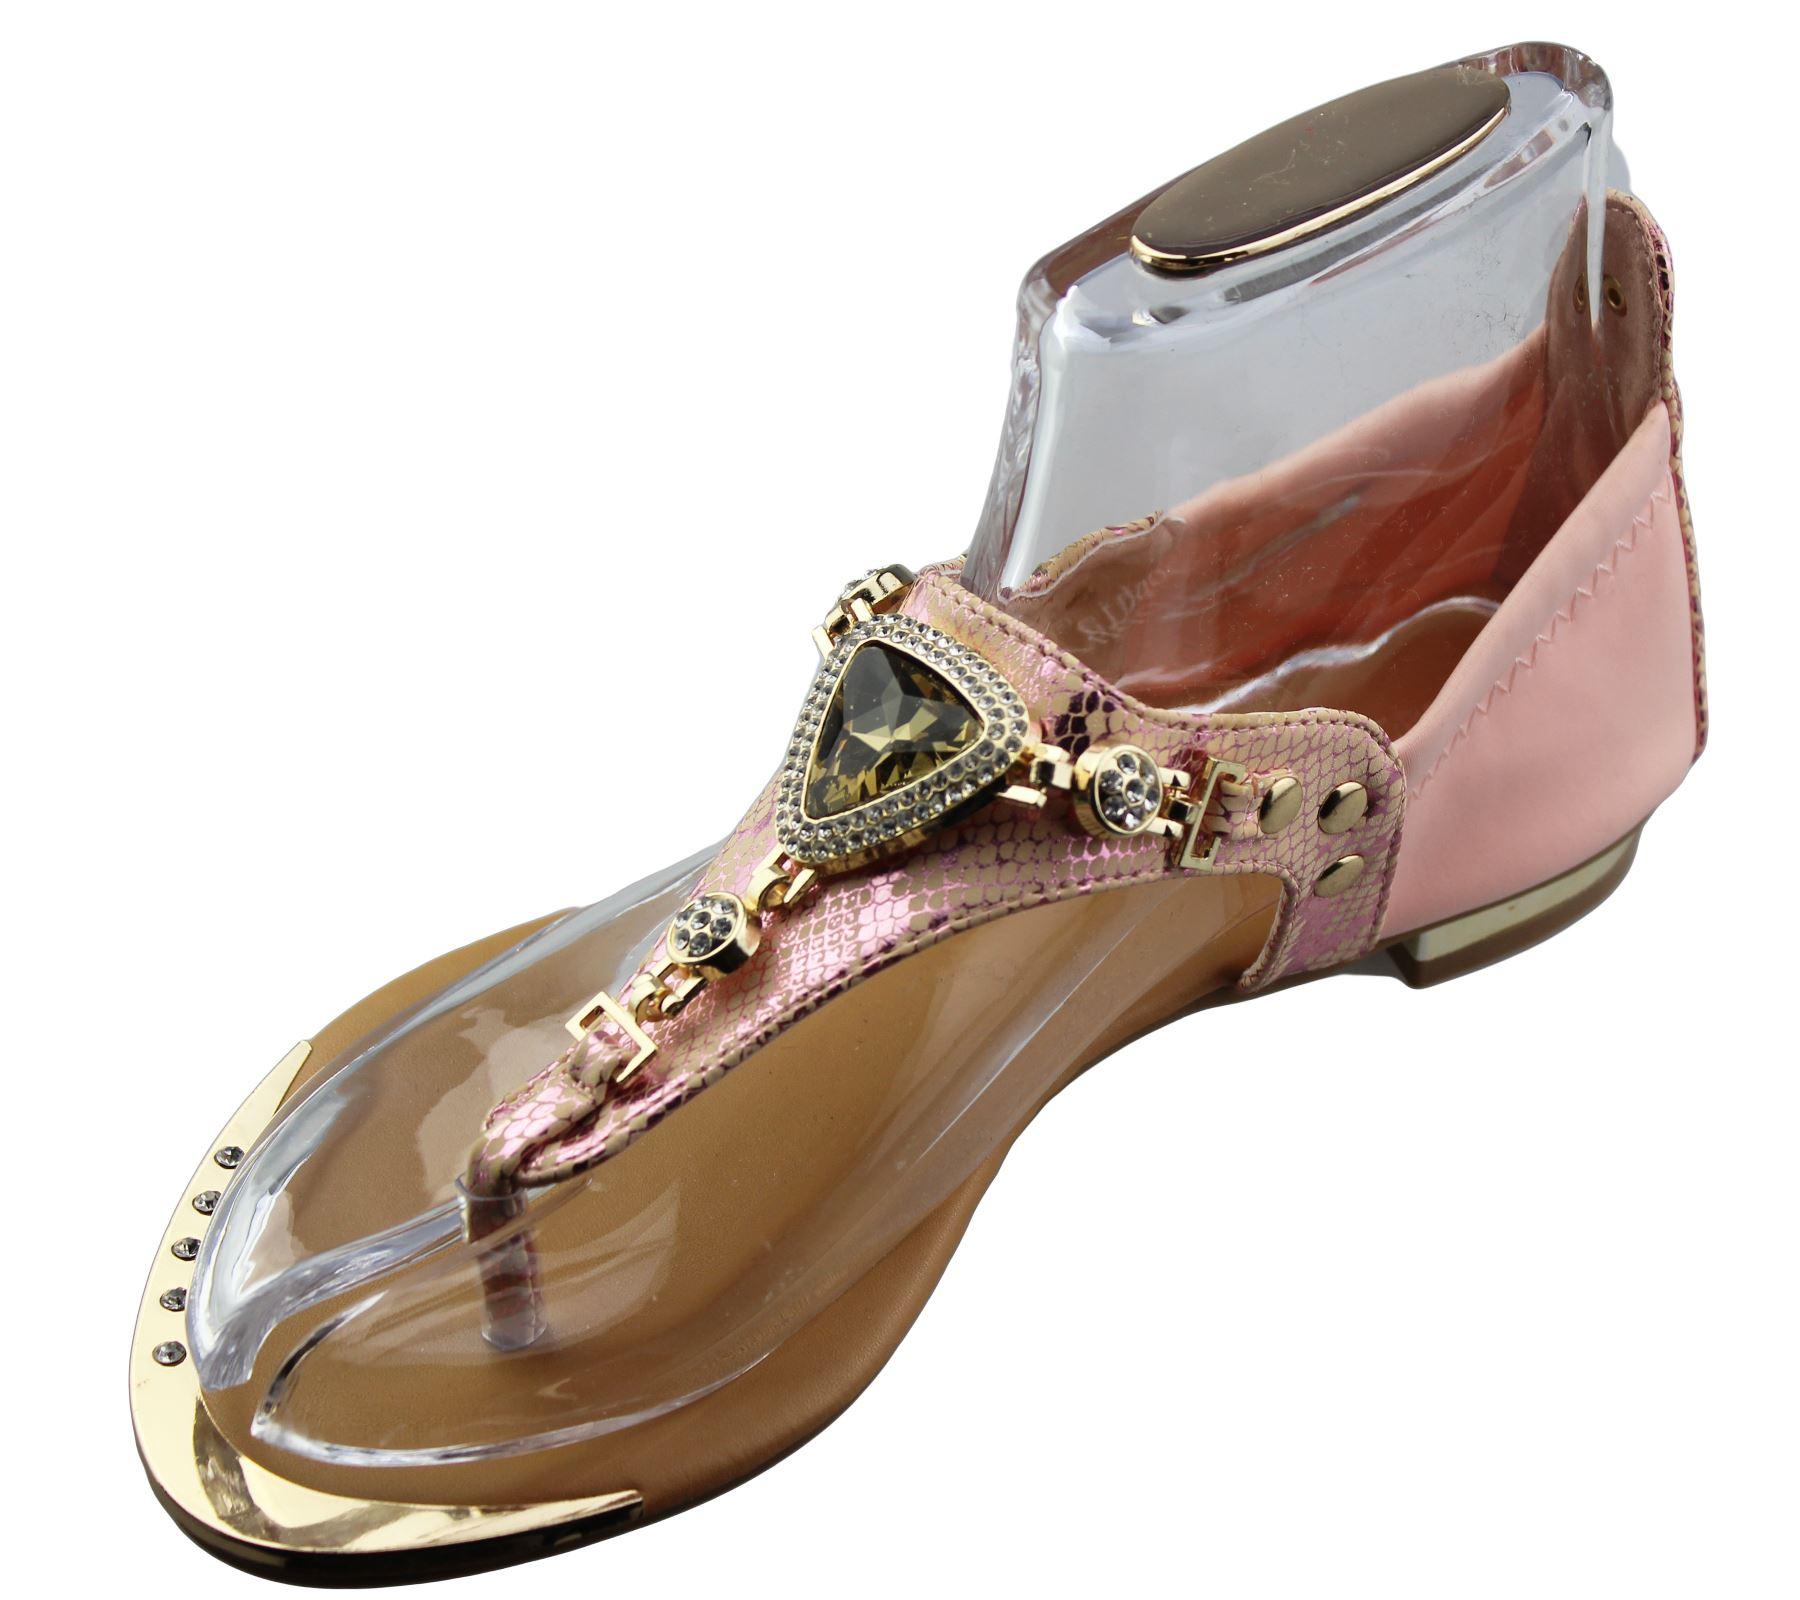 Womens-Flat-Summer-Sandals-Ladies-Diamante-Wedding-Toe-Post-Casual-Slipper thumbnail 29